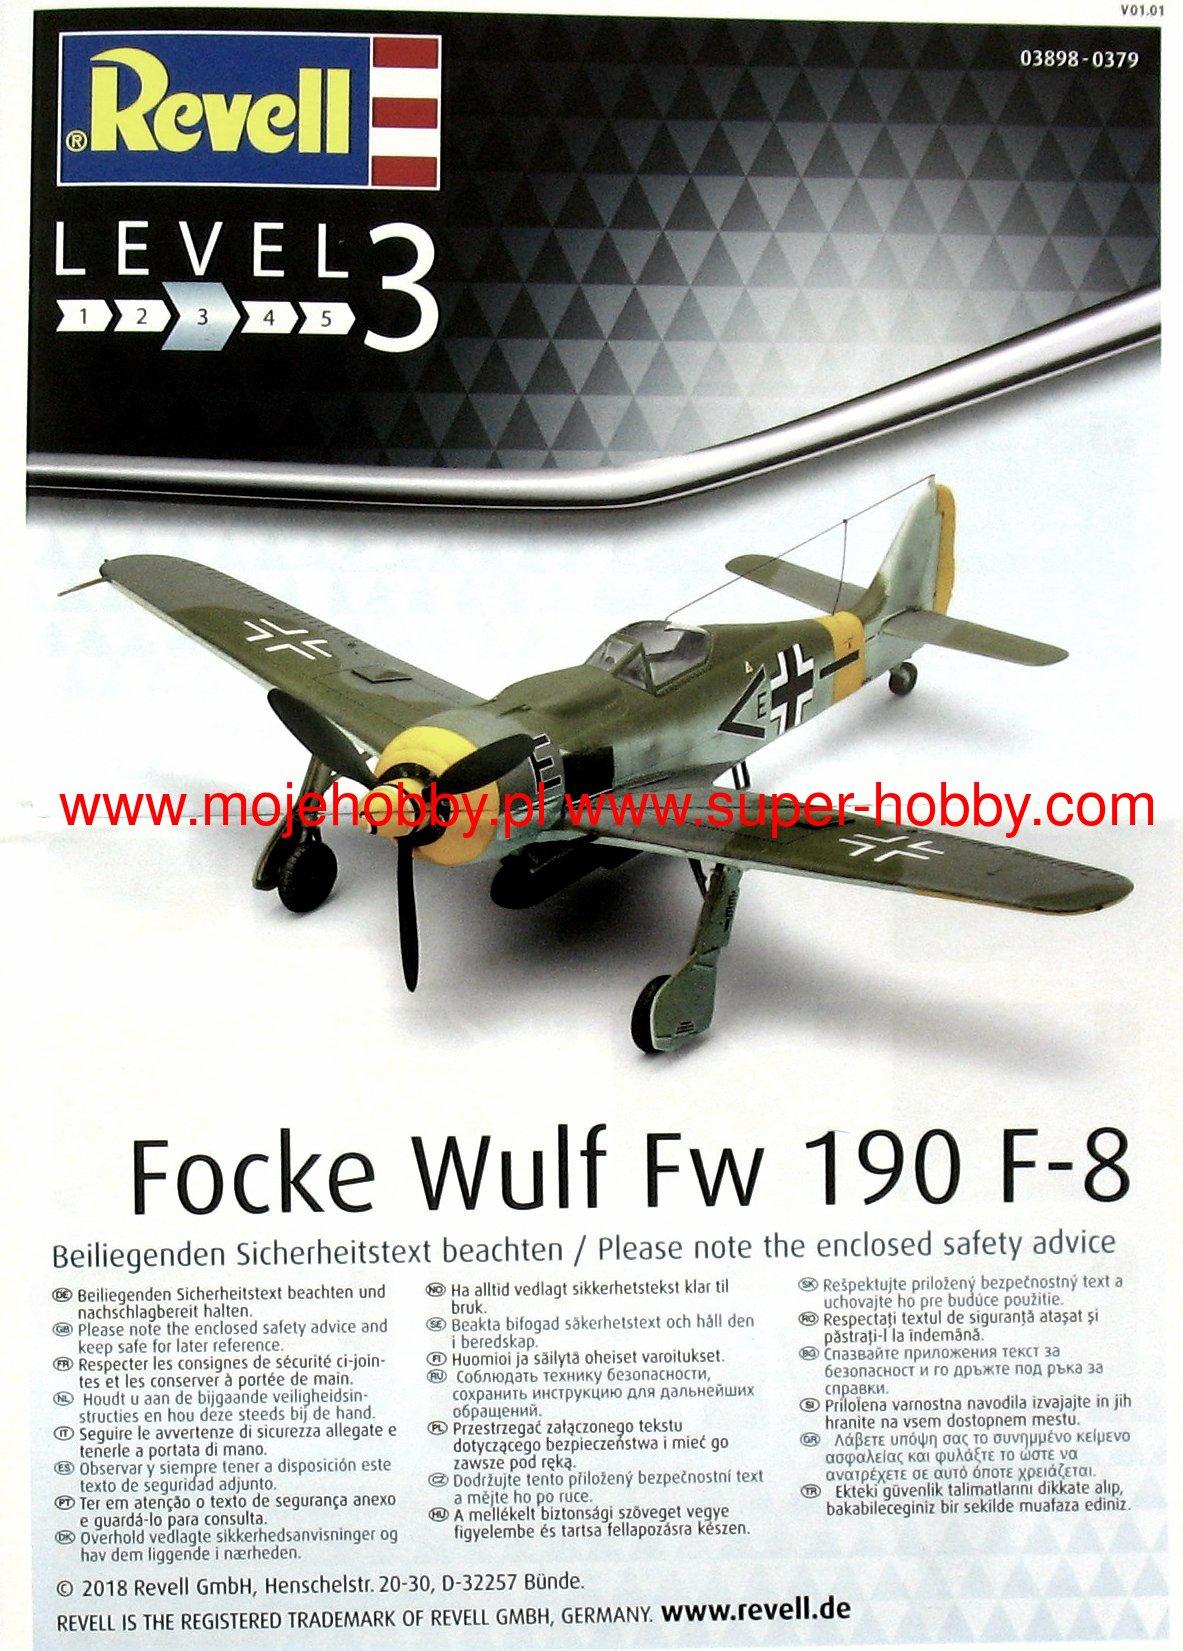 Revell Focke Wulf Fw 190 F-8 Level 3 Scale 1:72 Plane Model Kit 03898 NEW